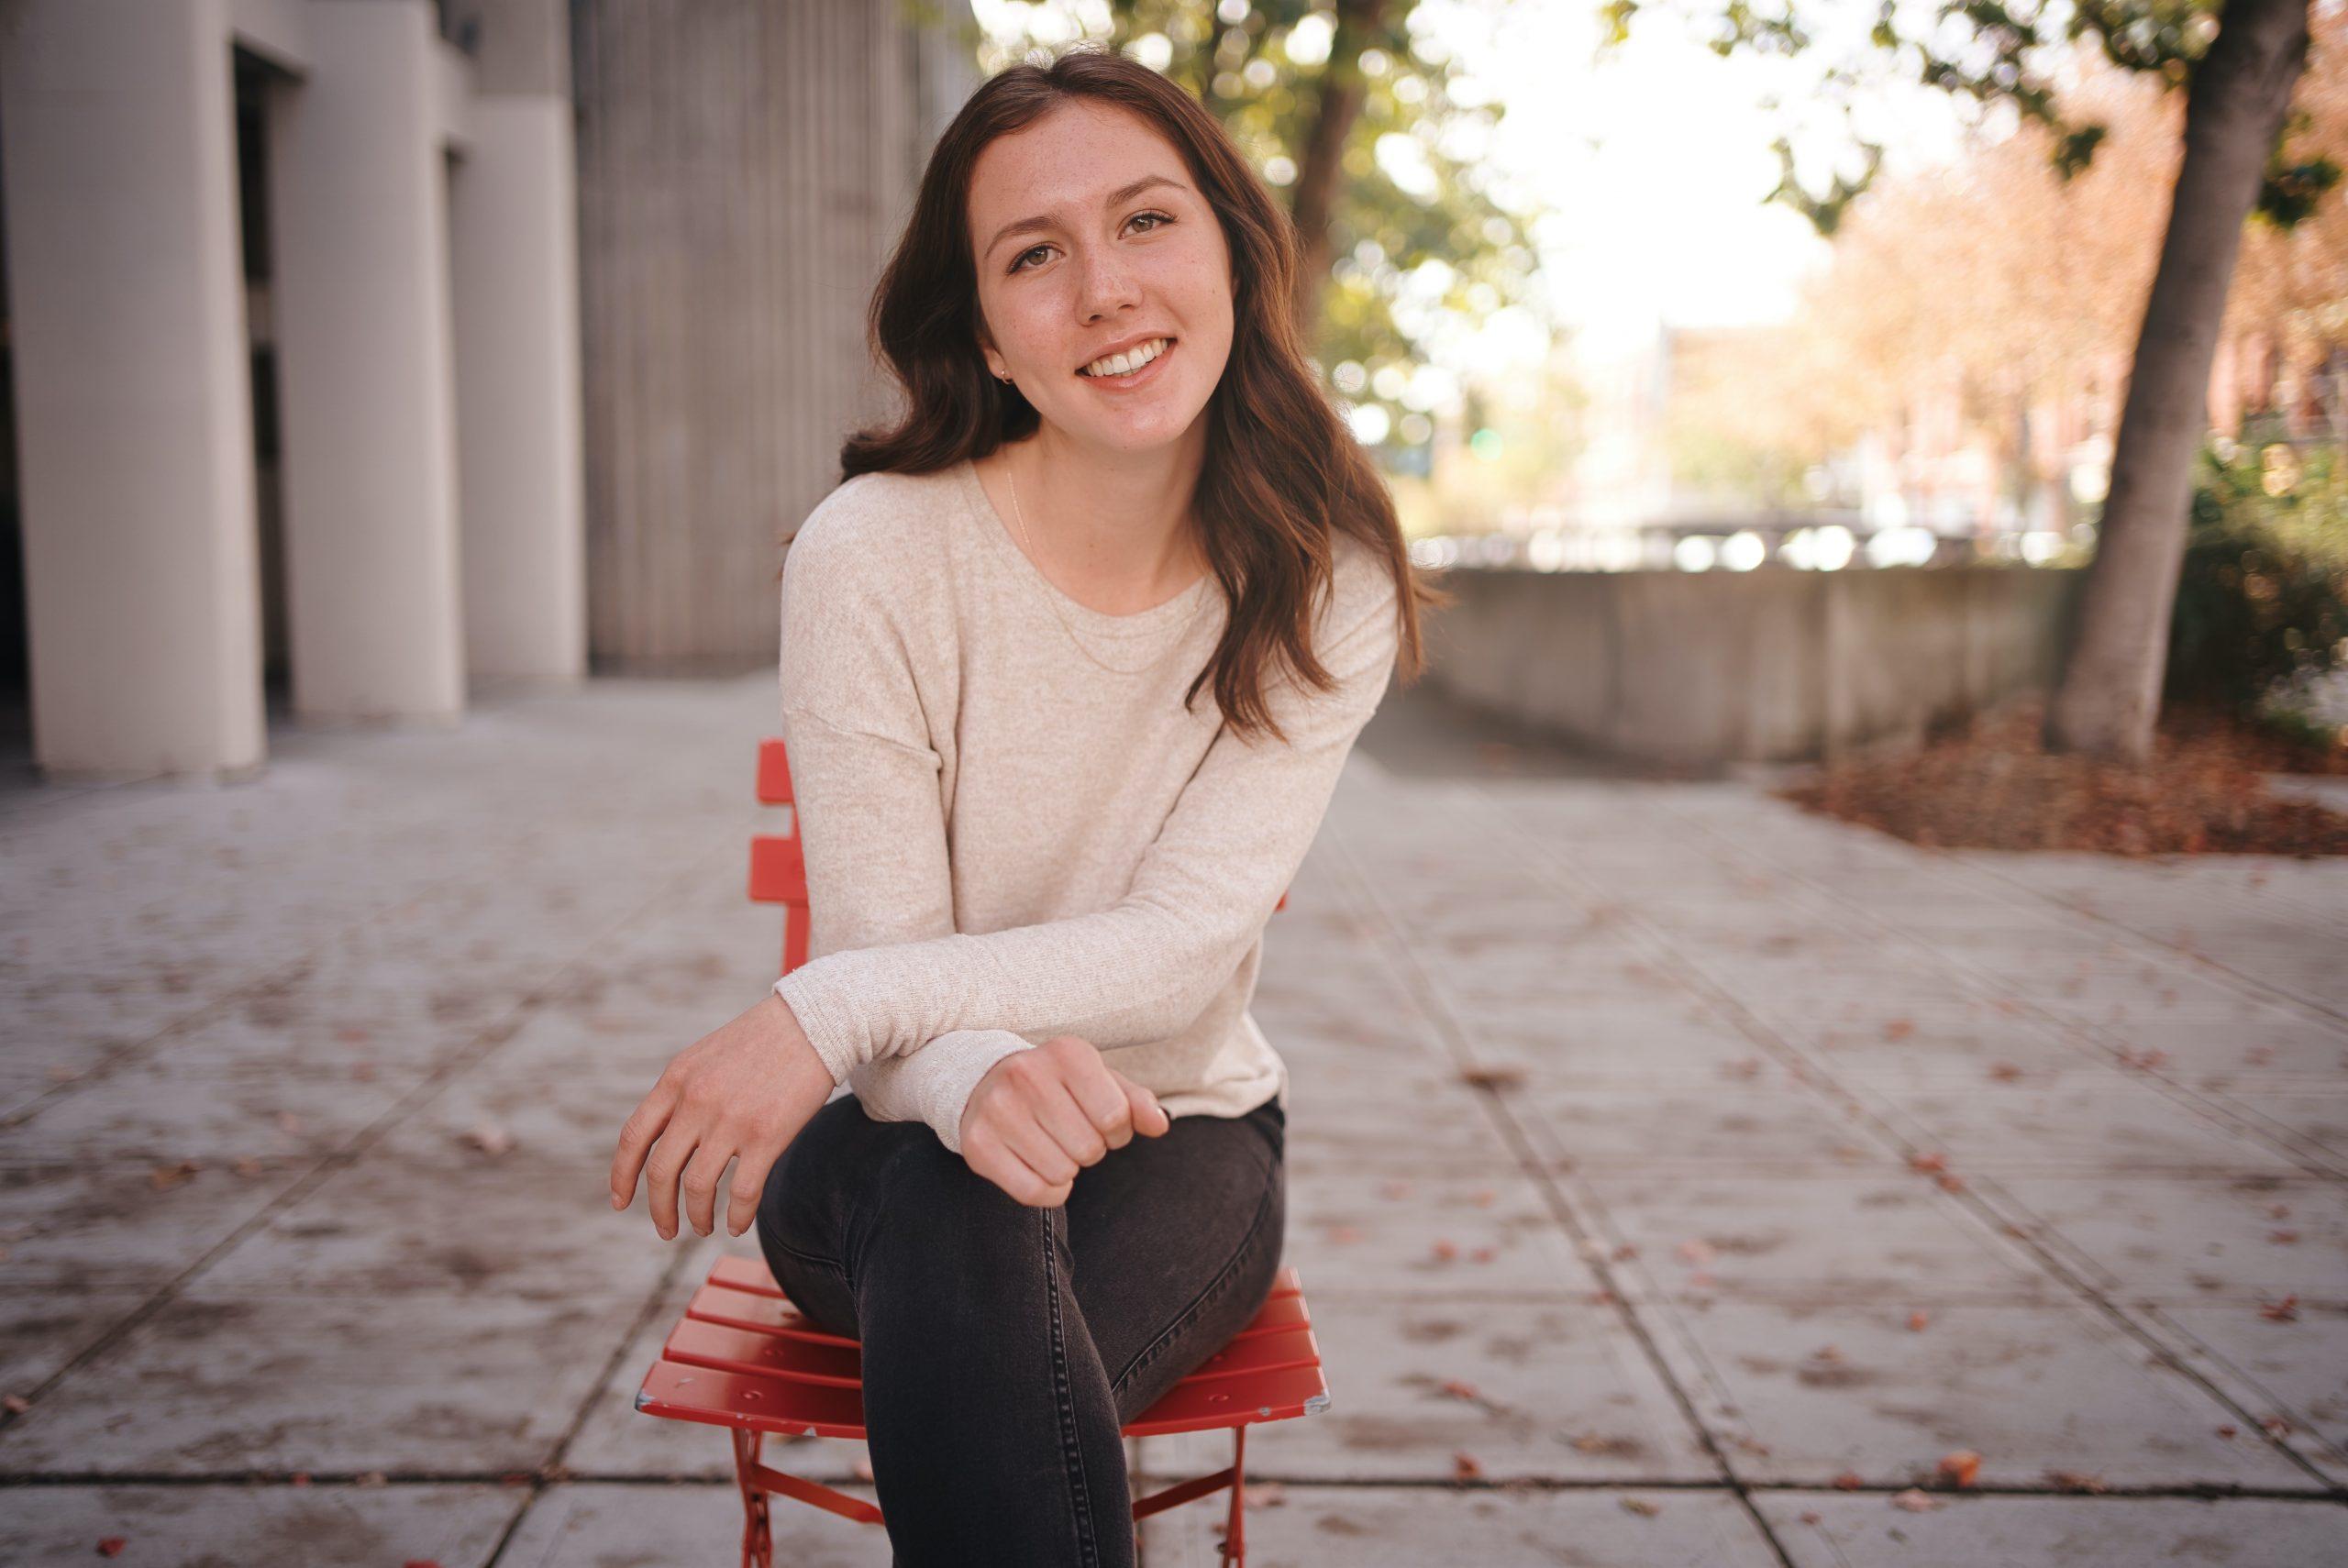 Highschool senior girl in white sweater sitting on sidewalk on bright red chair